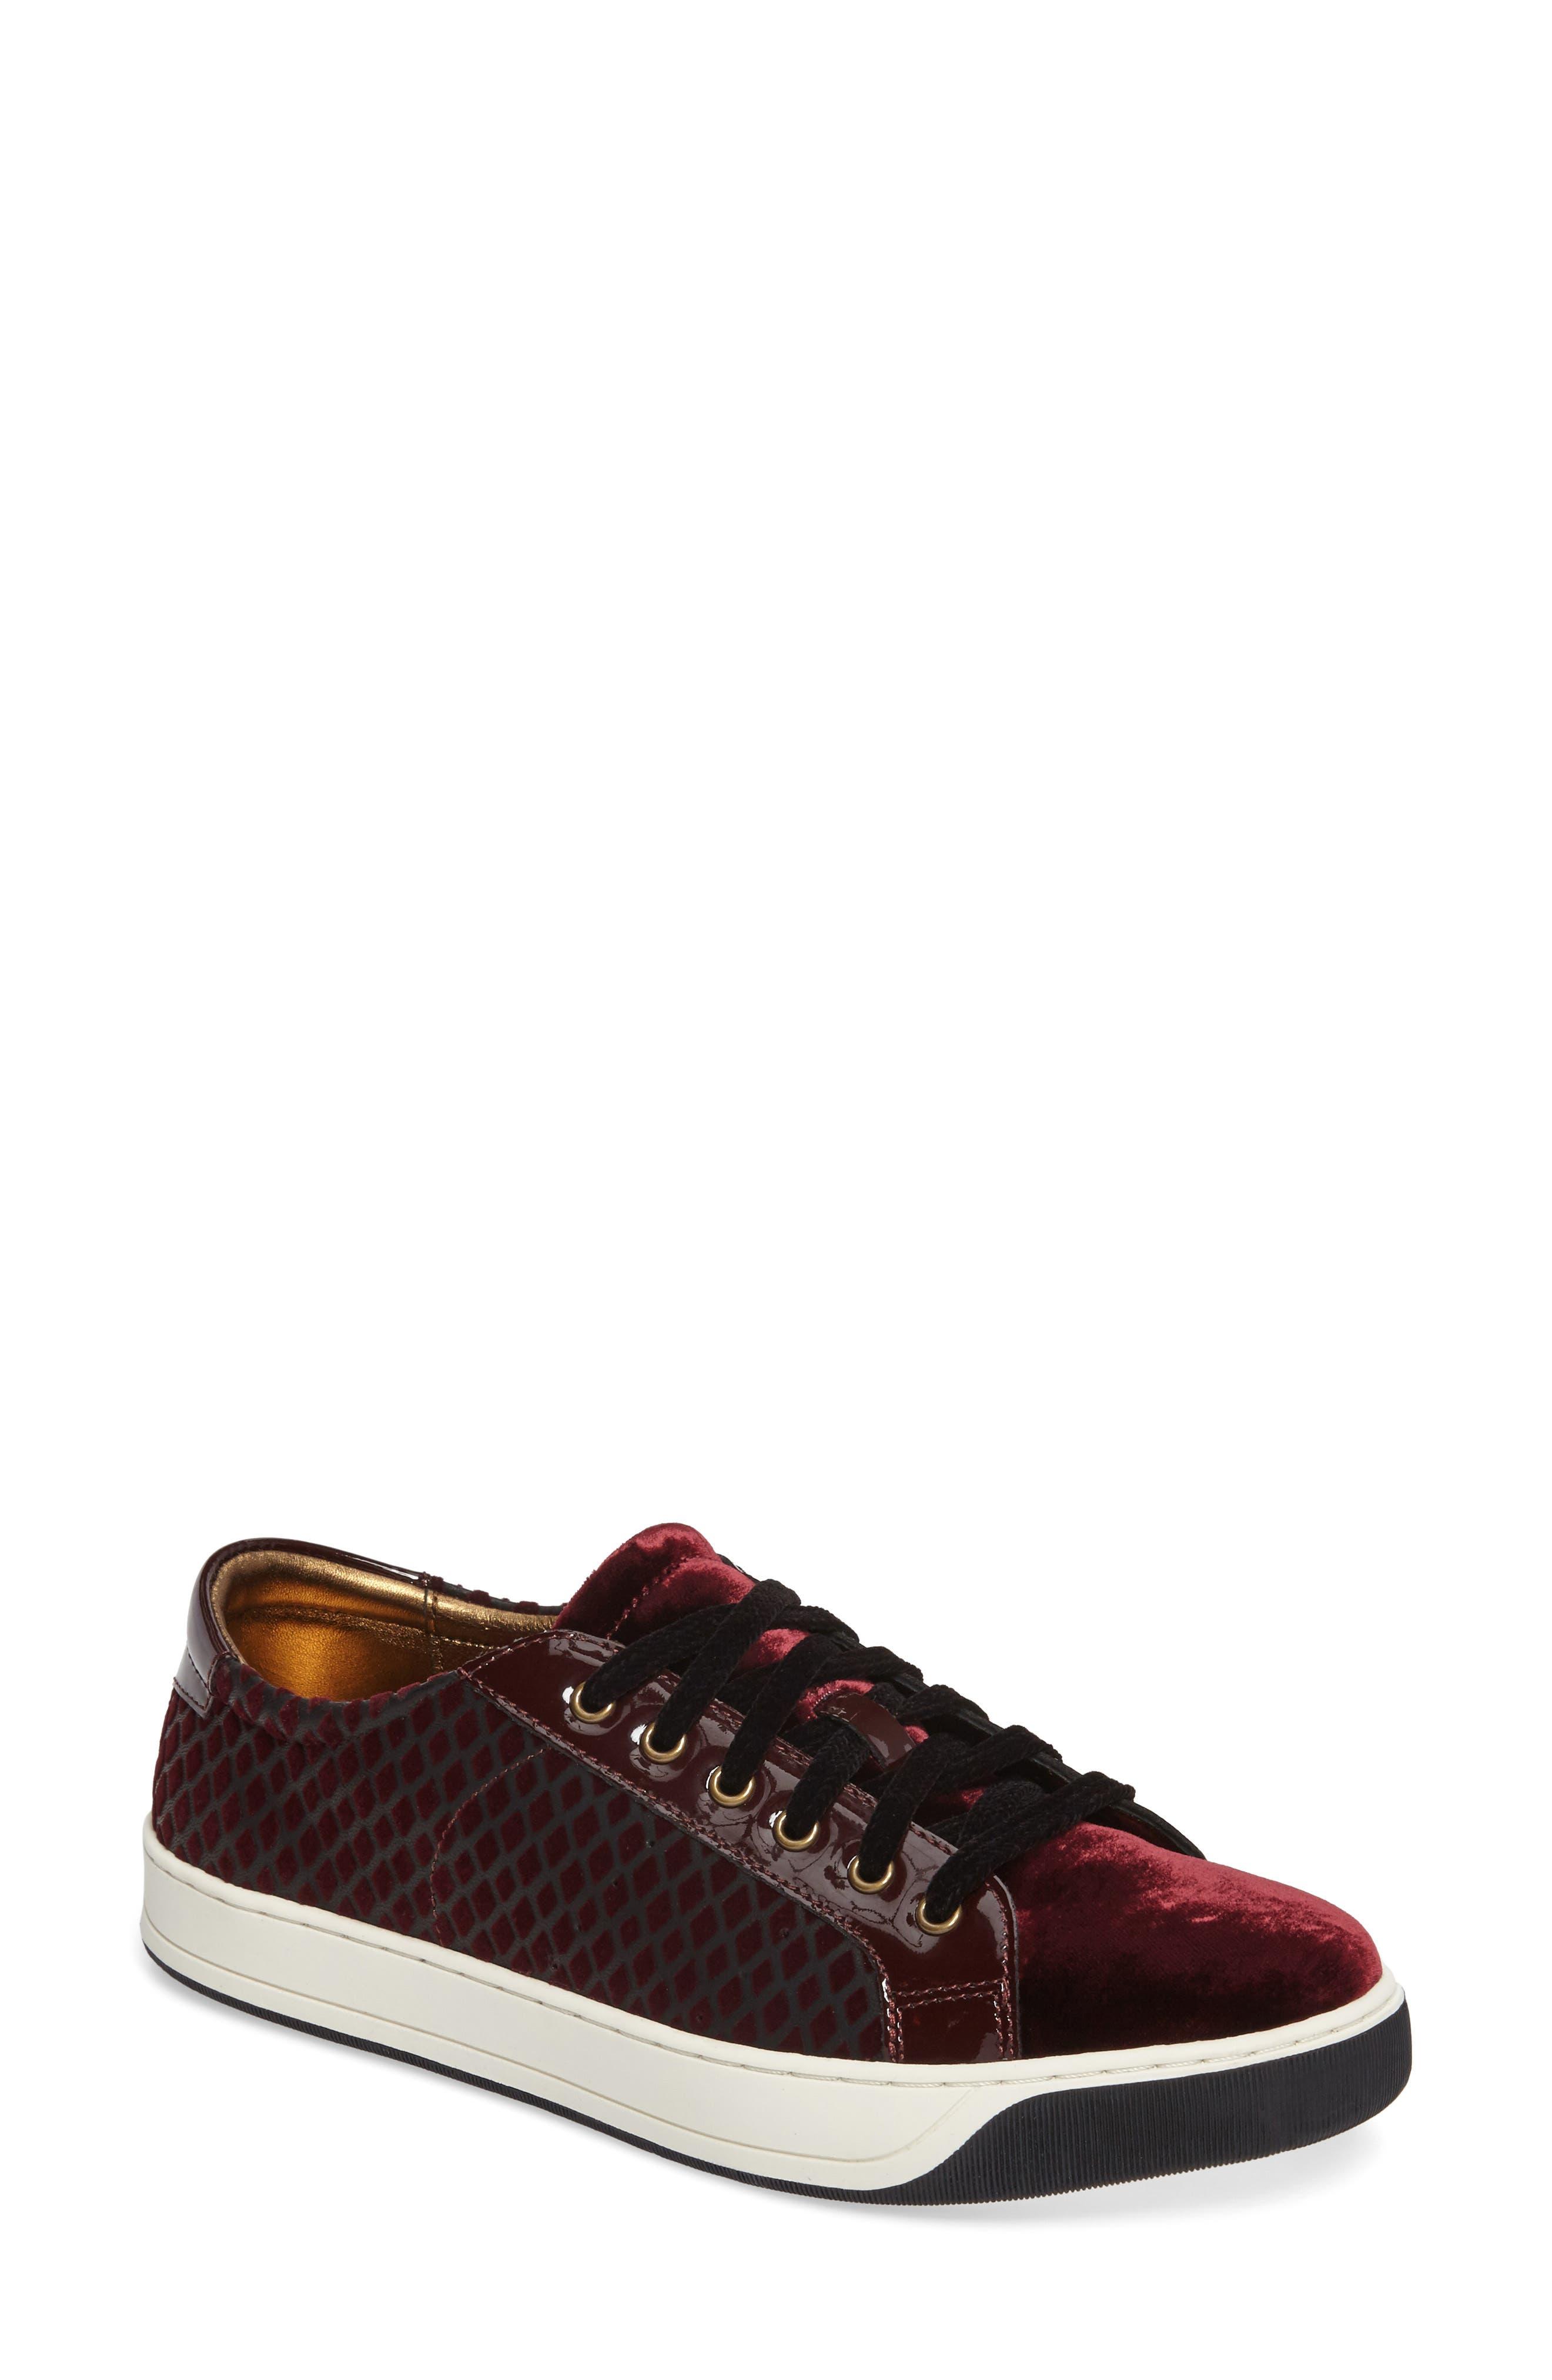 Alternate Image 1 Selected - Johnston & Murphy 'Emerson' Sneaker (Women)